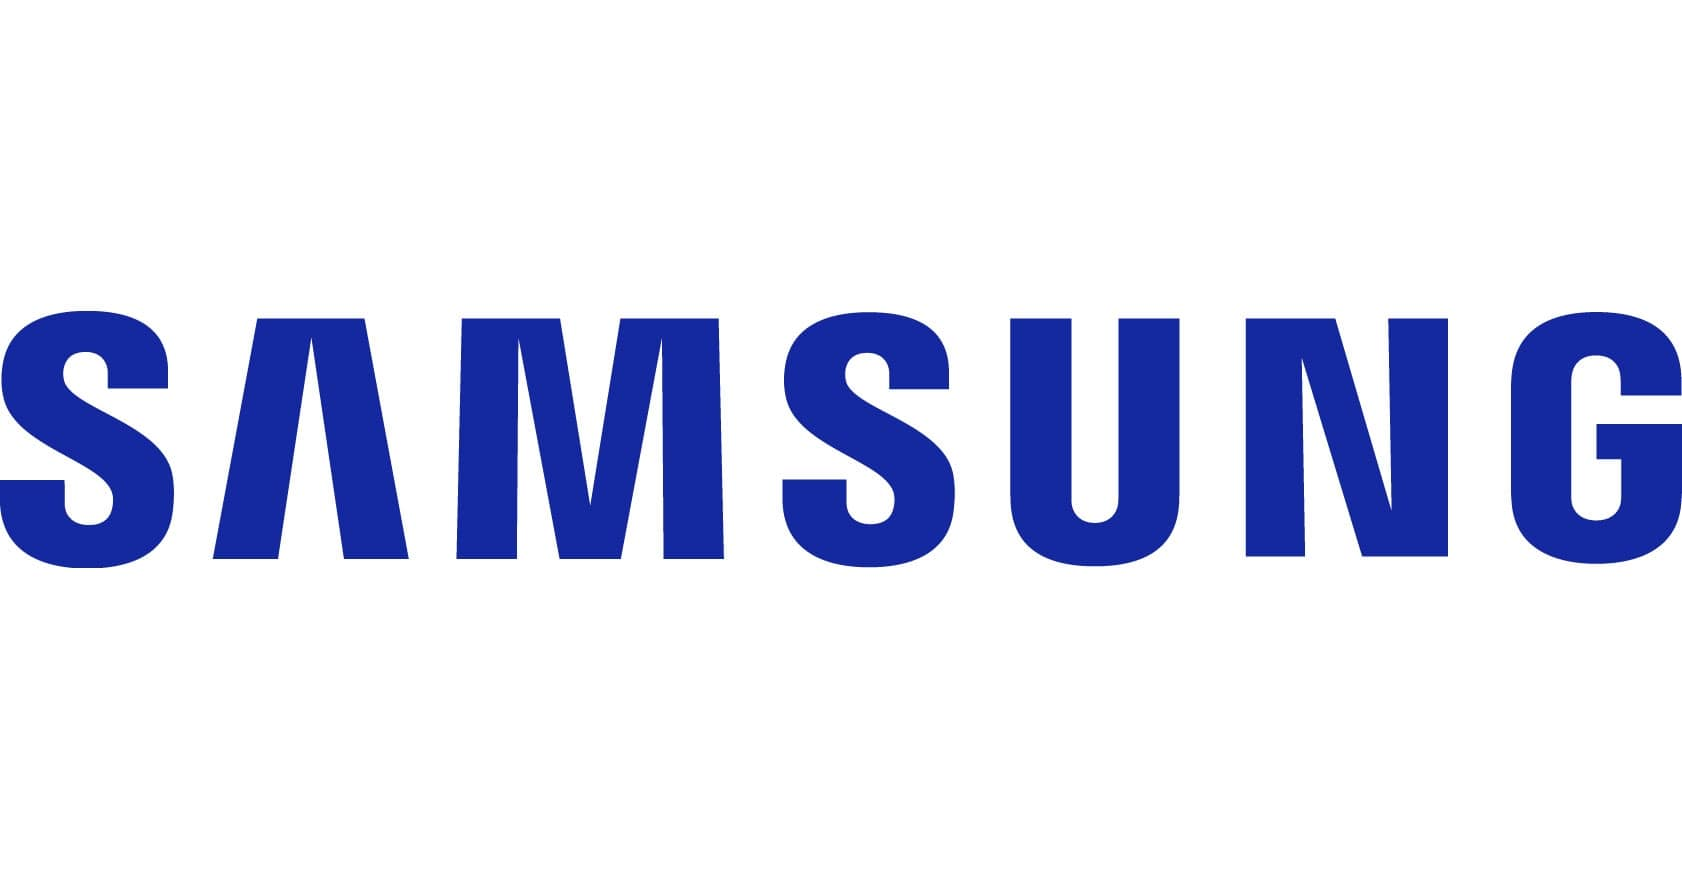 Samsung EPP: Galaxy Book Pro 13.3 with 11th Gen Intel i5 with 8 GB ram 256SSD with free Galaxy Buds $599